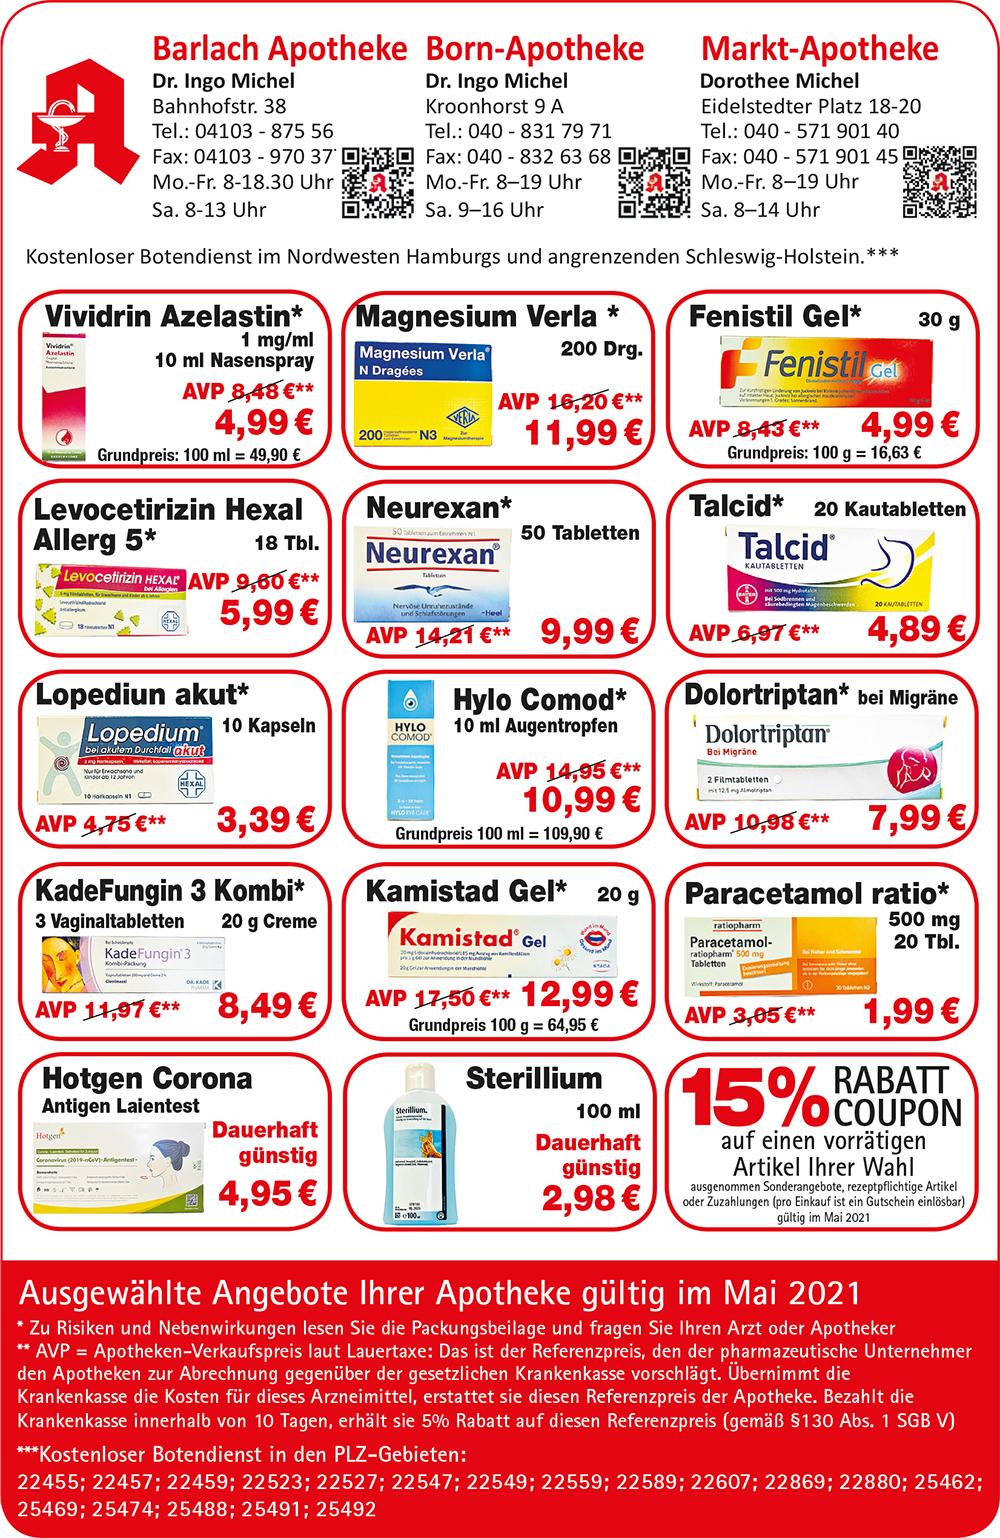 https://www.apotheken.de/fileadmin/clubarea/00000-Angebote/22523_markt_angebot_1.jpg